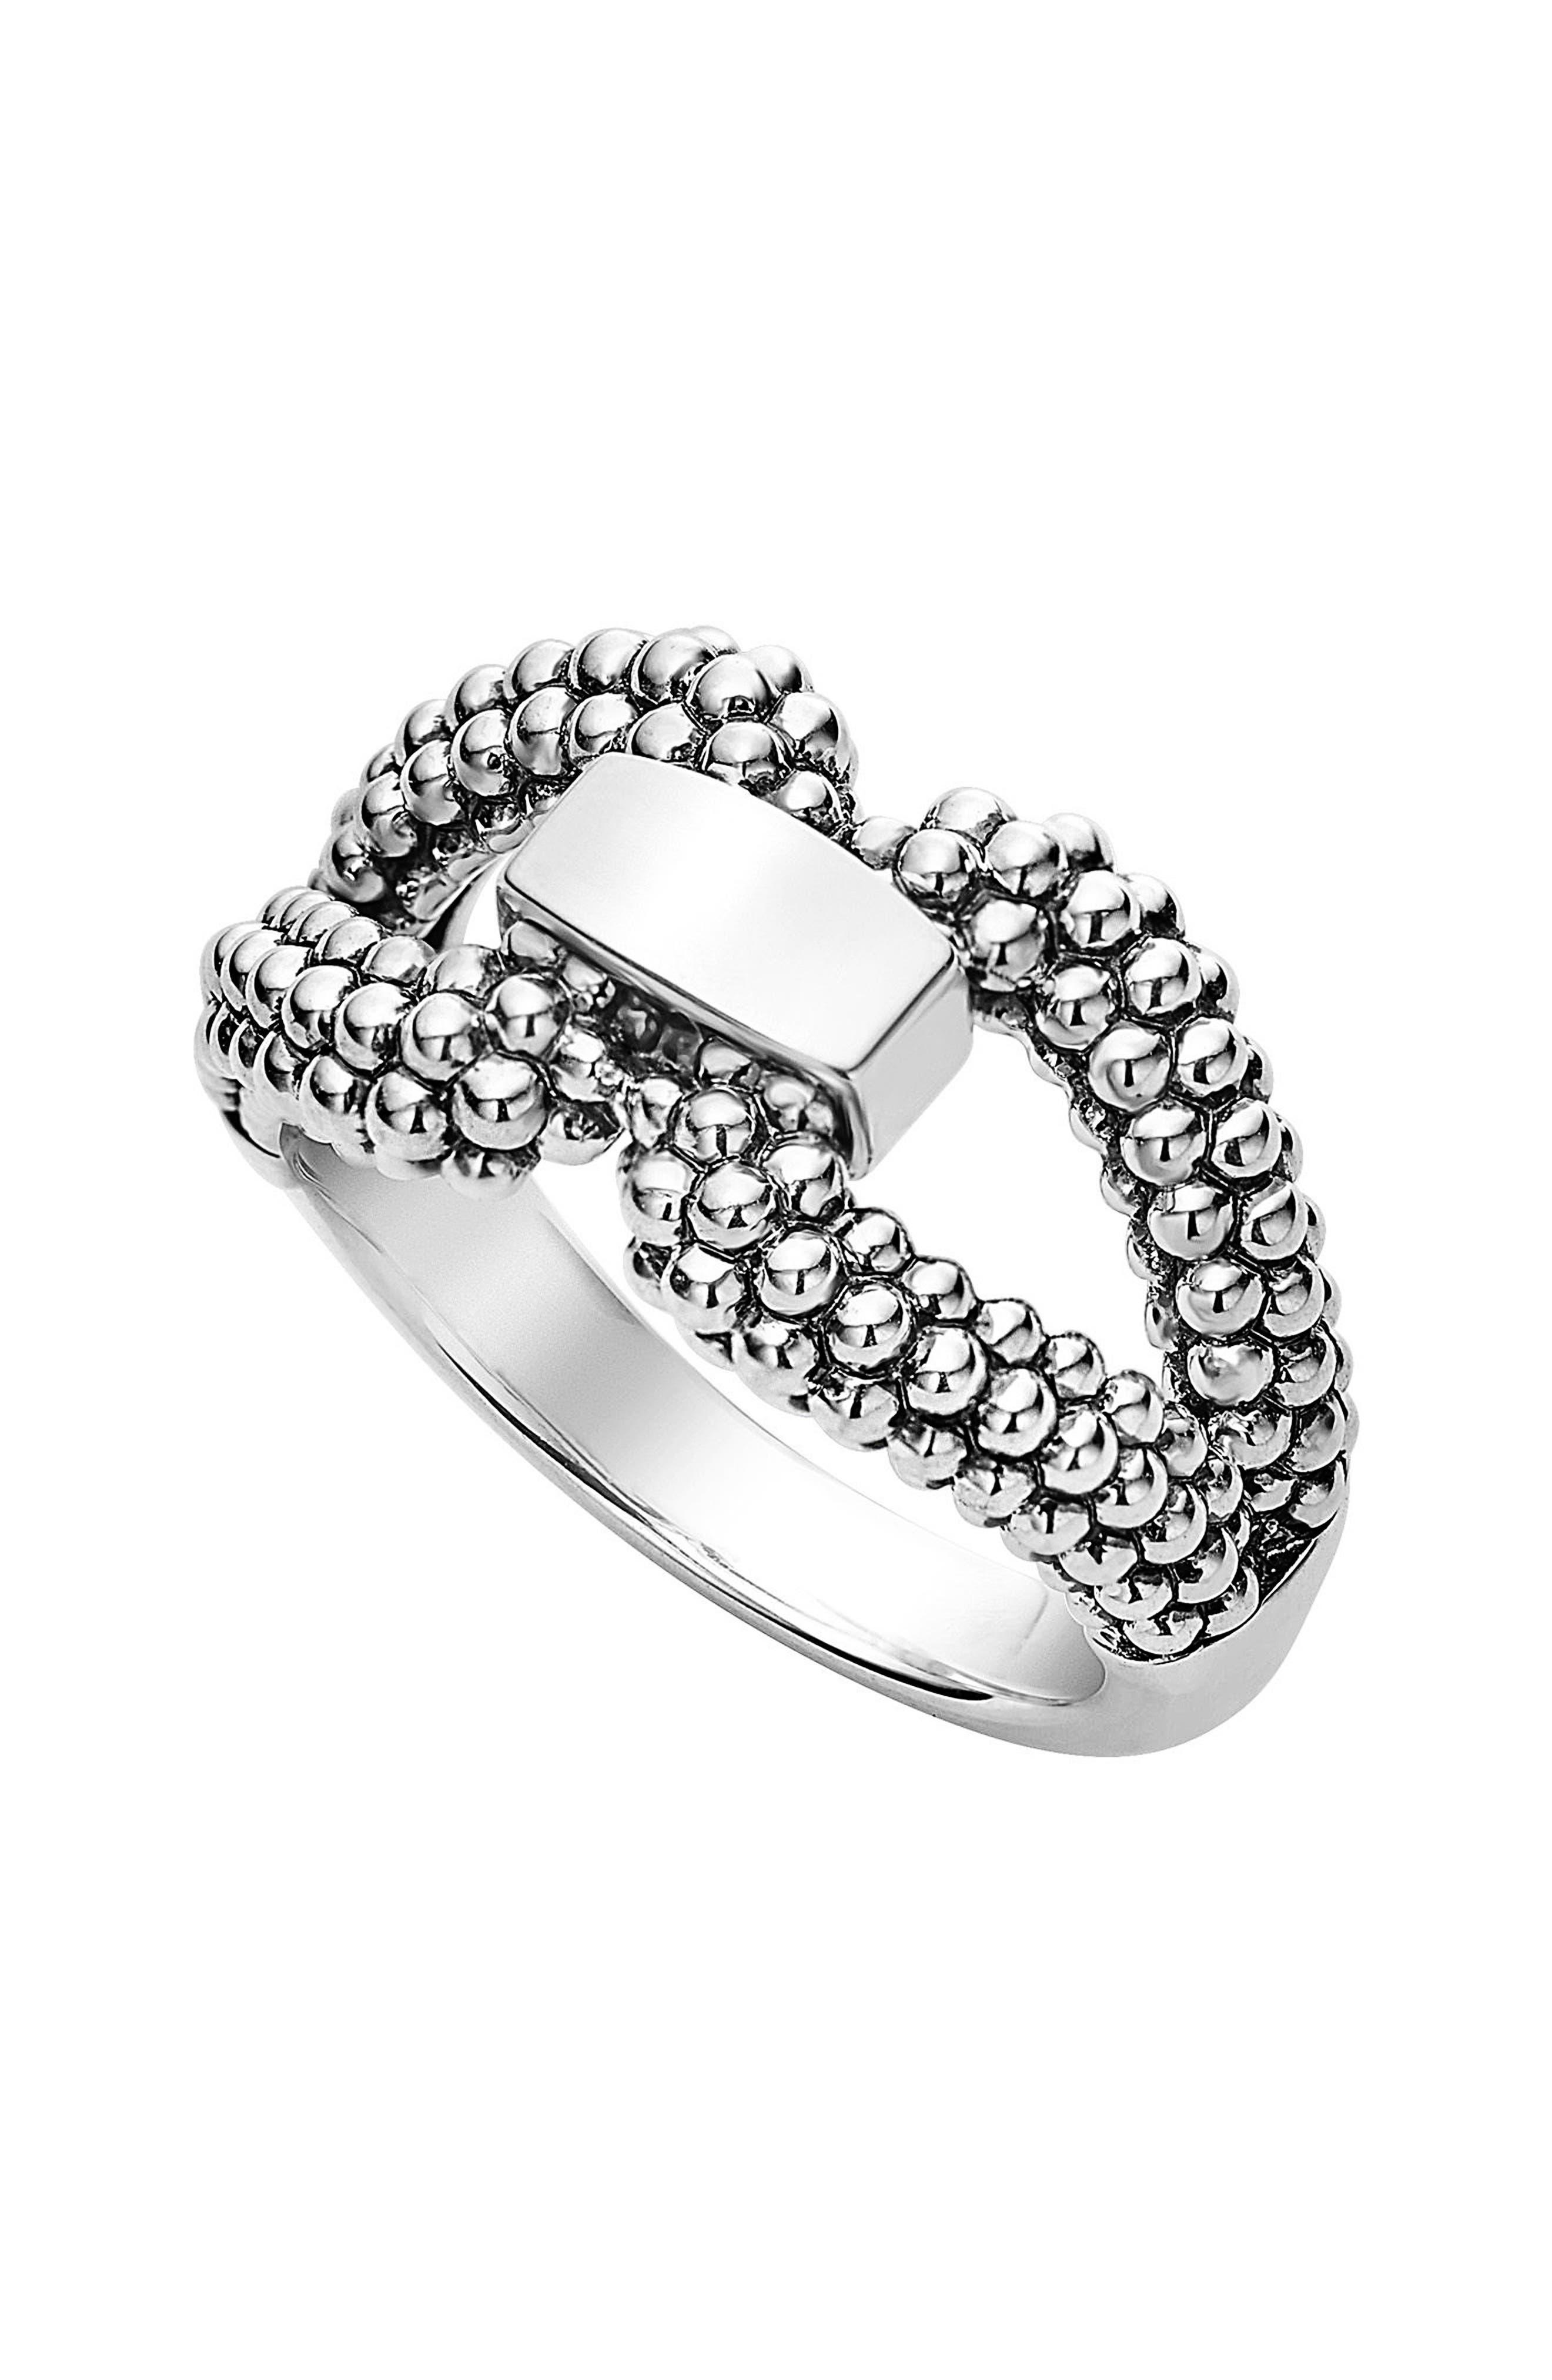 Main Image - LAGOS Derby Caviar Ring